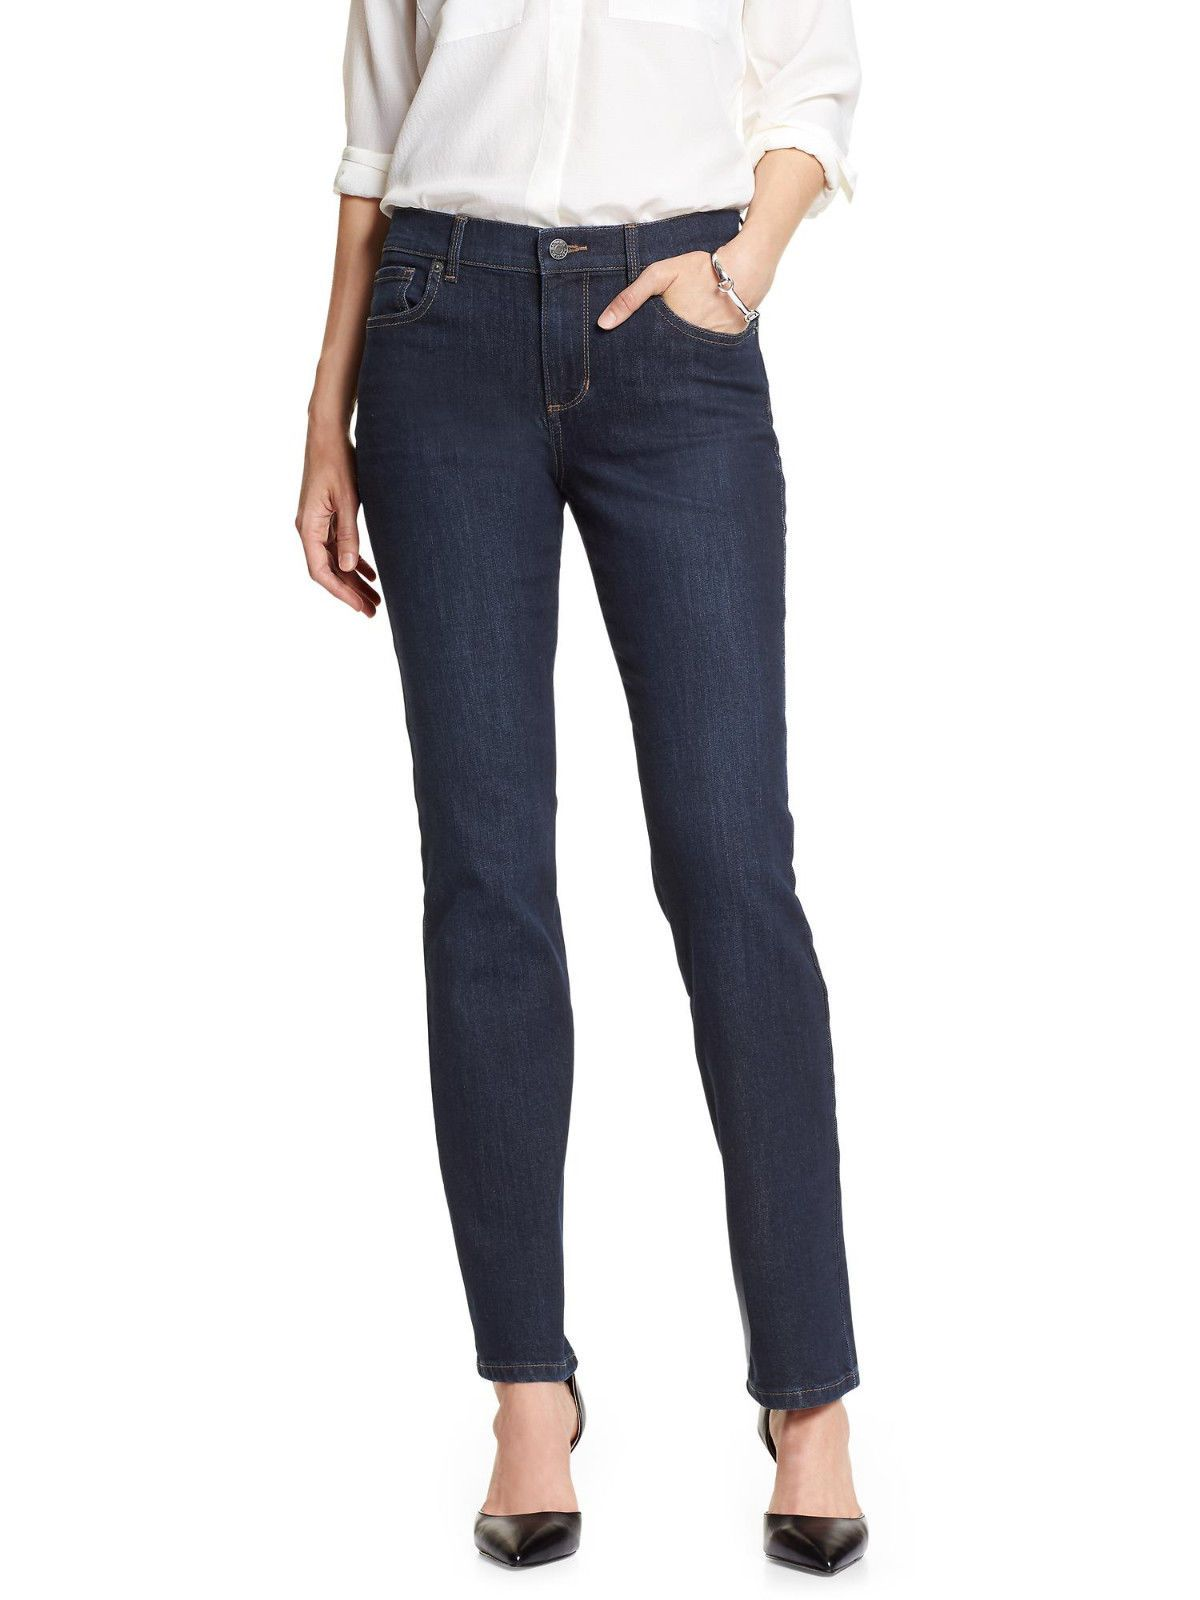 6fc5b63b10613 6336-2 Banana Republic Womens Dark Blue Rinse Straight Leg Jeans Sz 29 / 8  $70